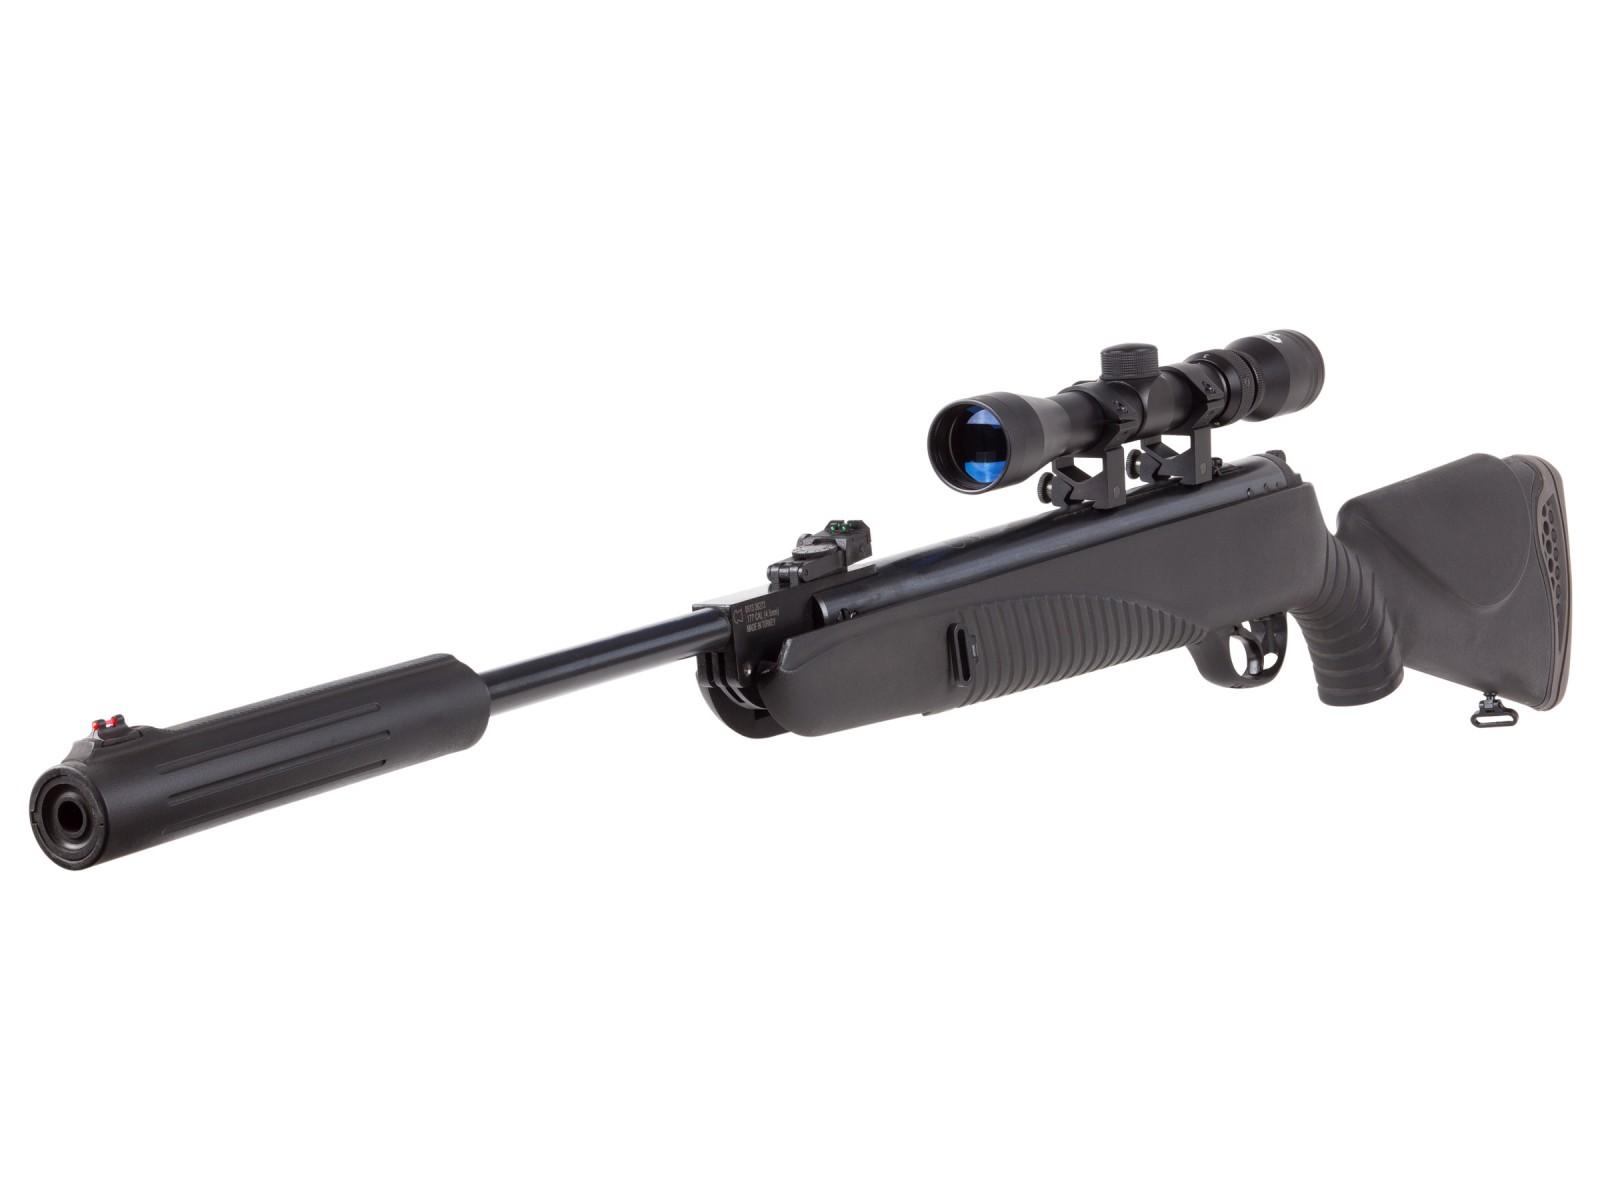 magnum sniper air flow - HD1600×1200